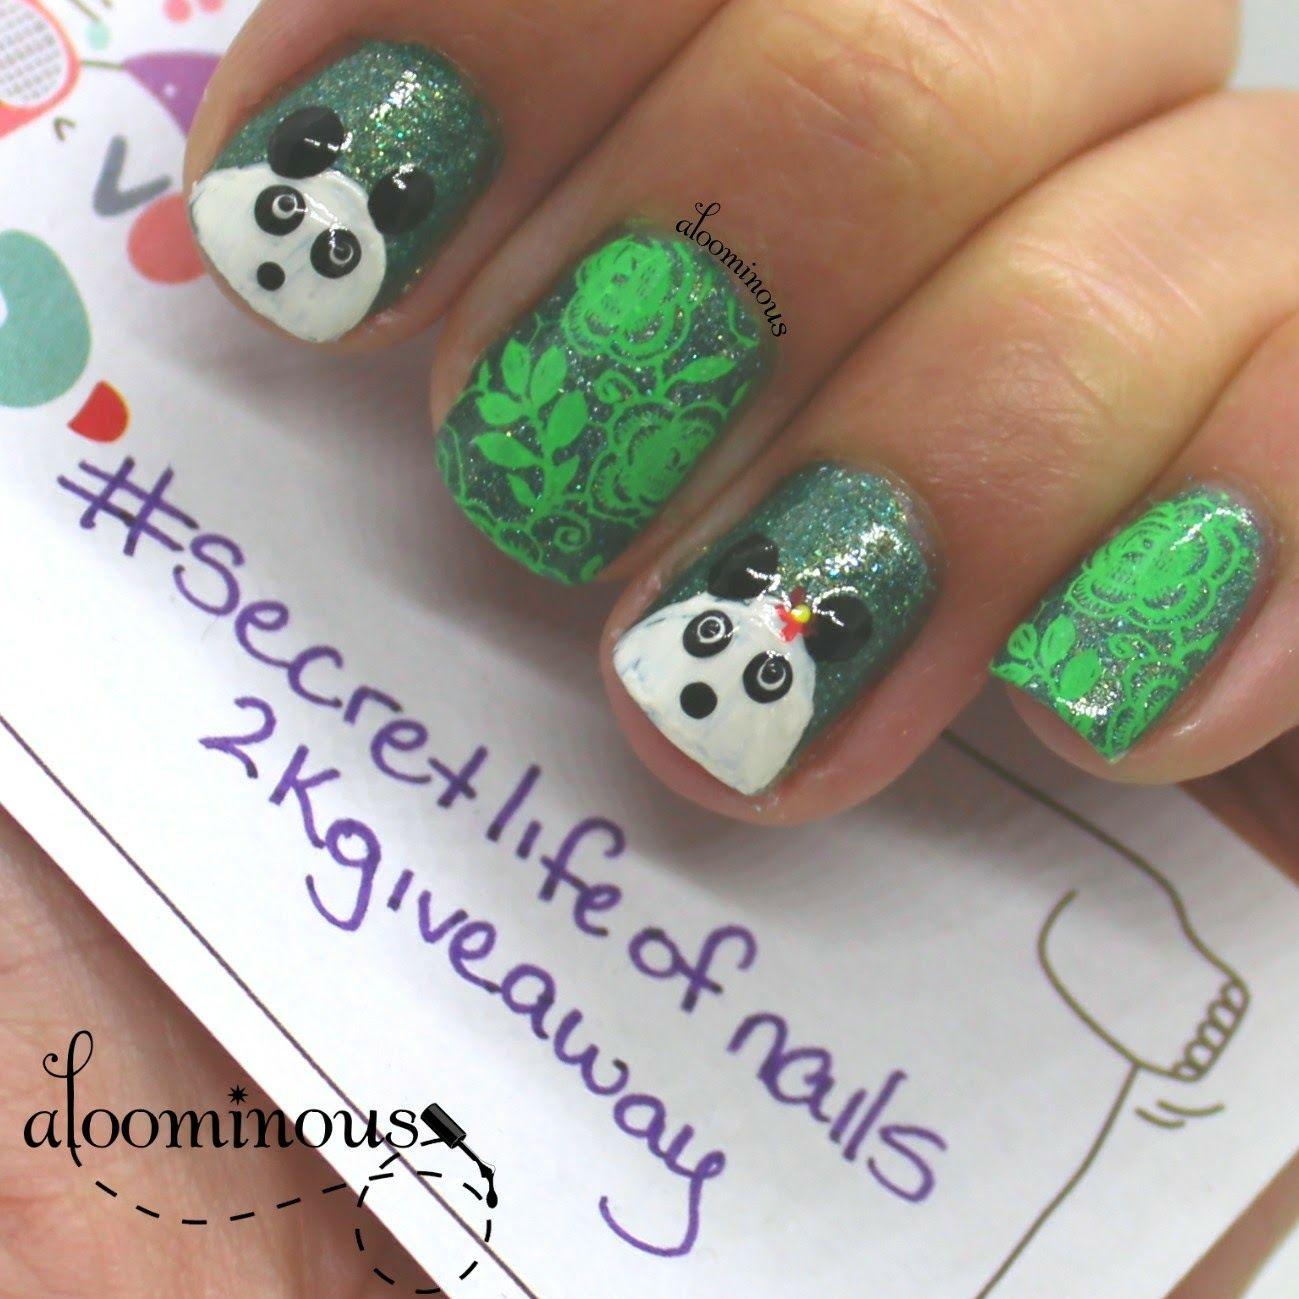 Panda nails for the instagrams: secretlifeofnails 2k giveaway ...